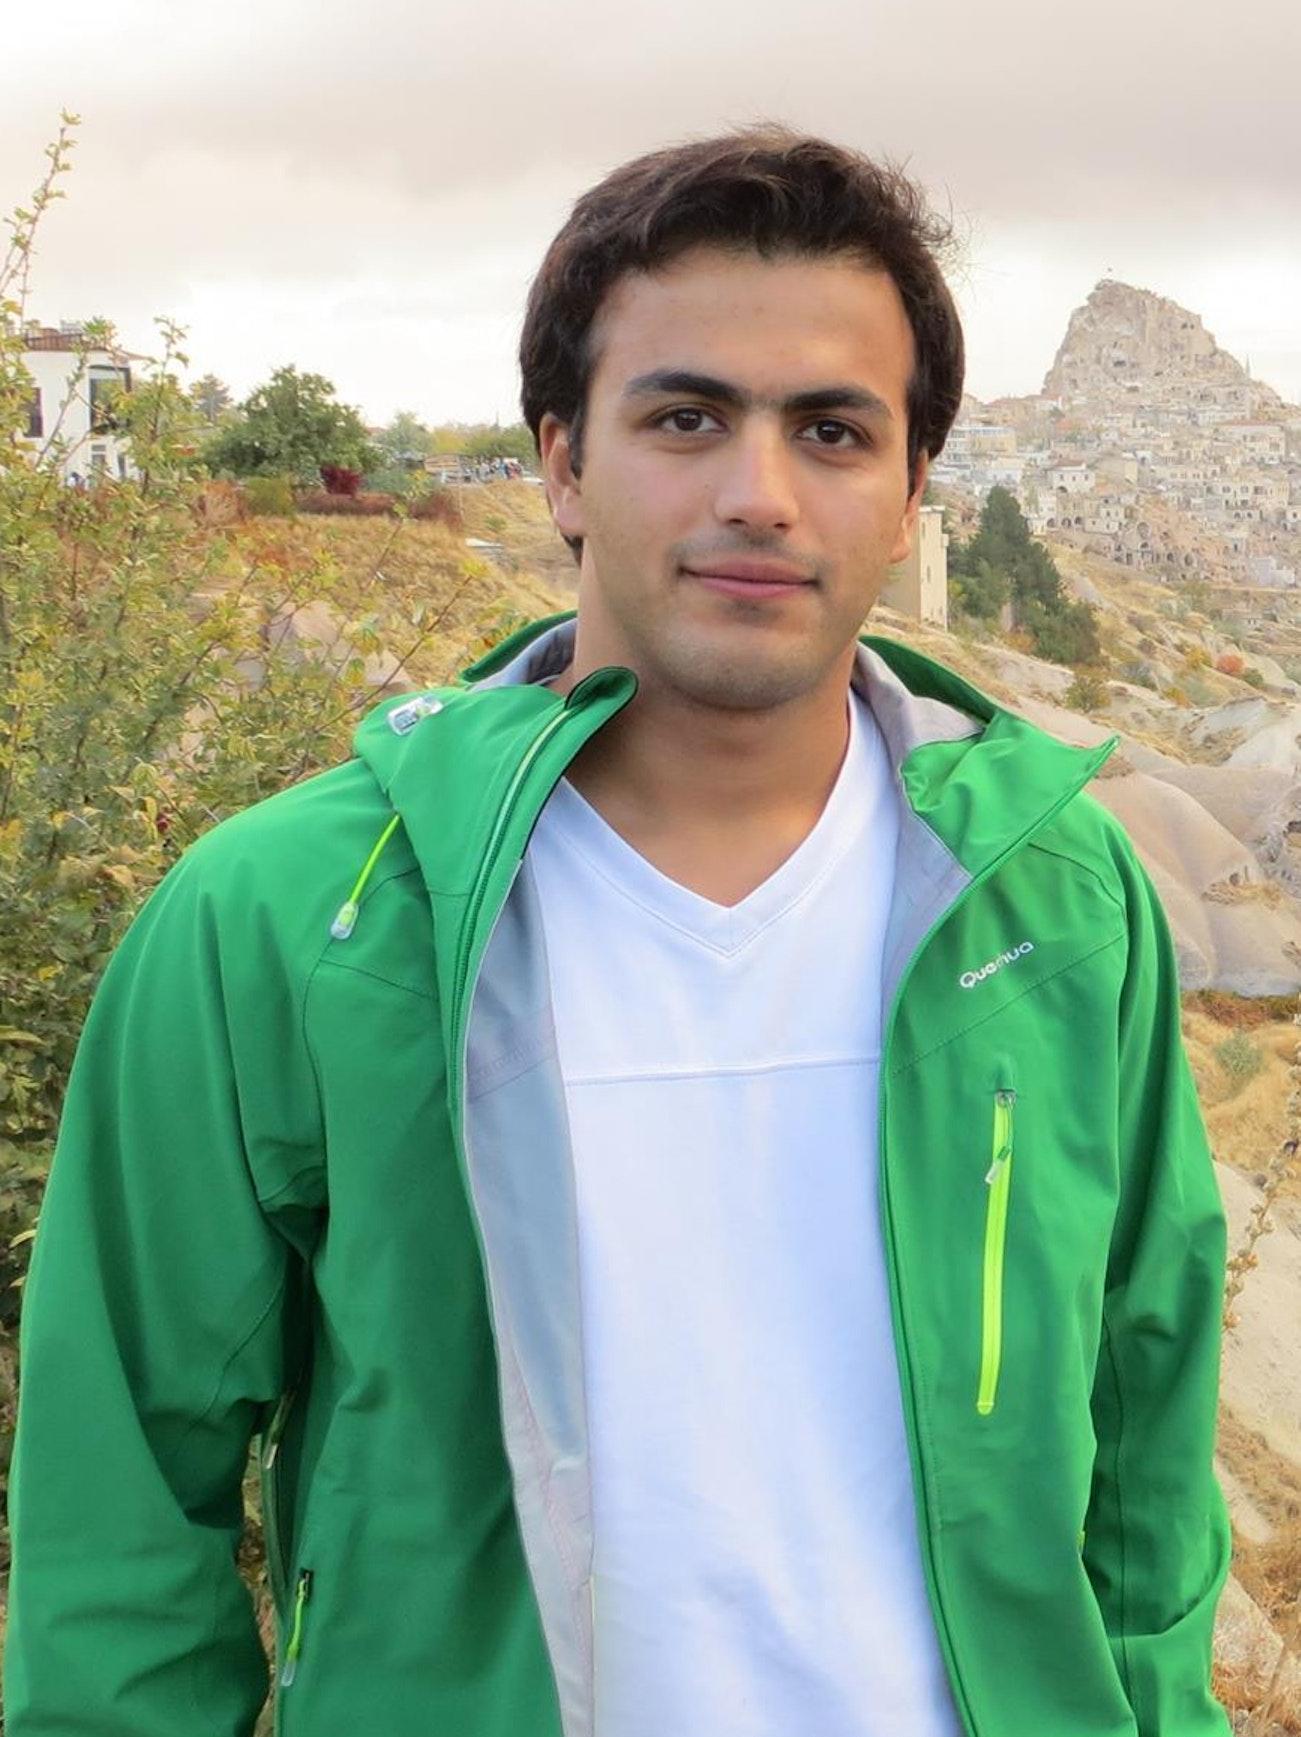 Farhad Ghorbani